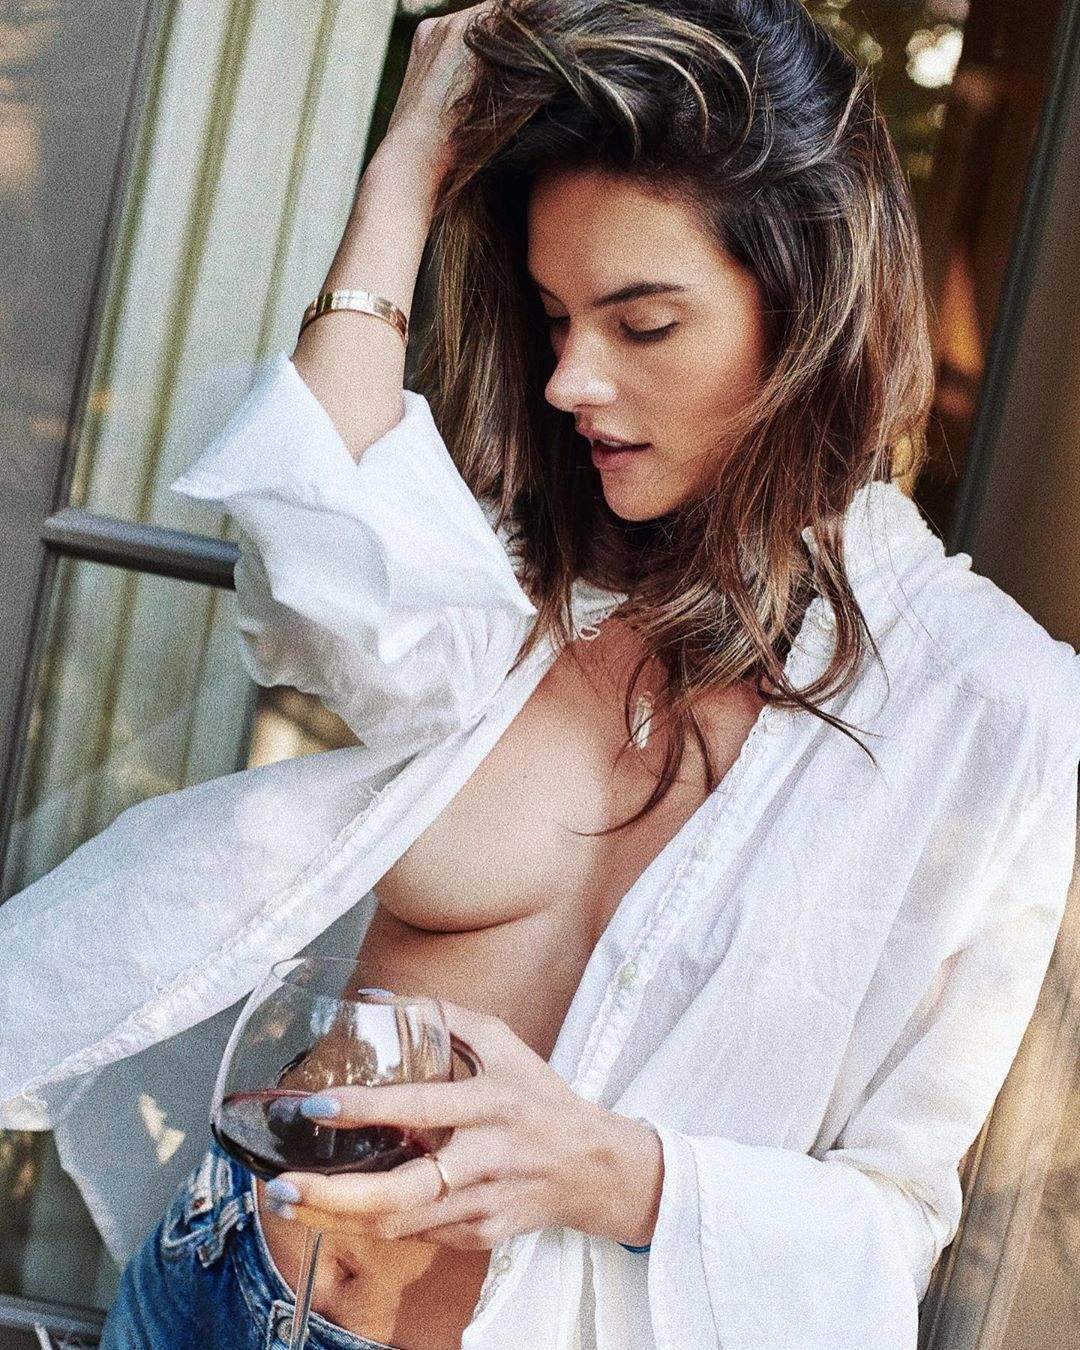 Alessandra Ambrosio – Sexy Sideboob In Hot Braless Photoshoot 0001